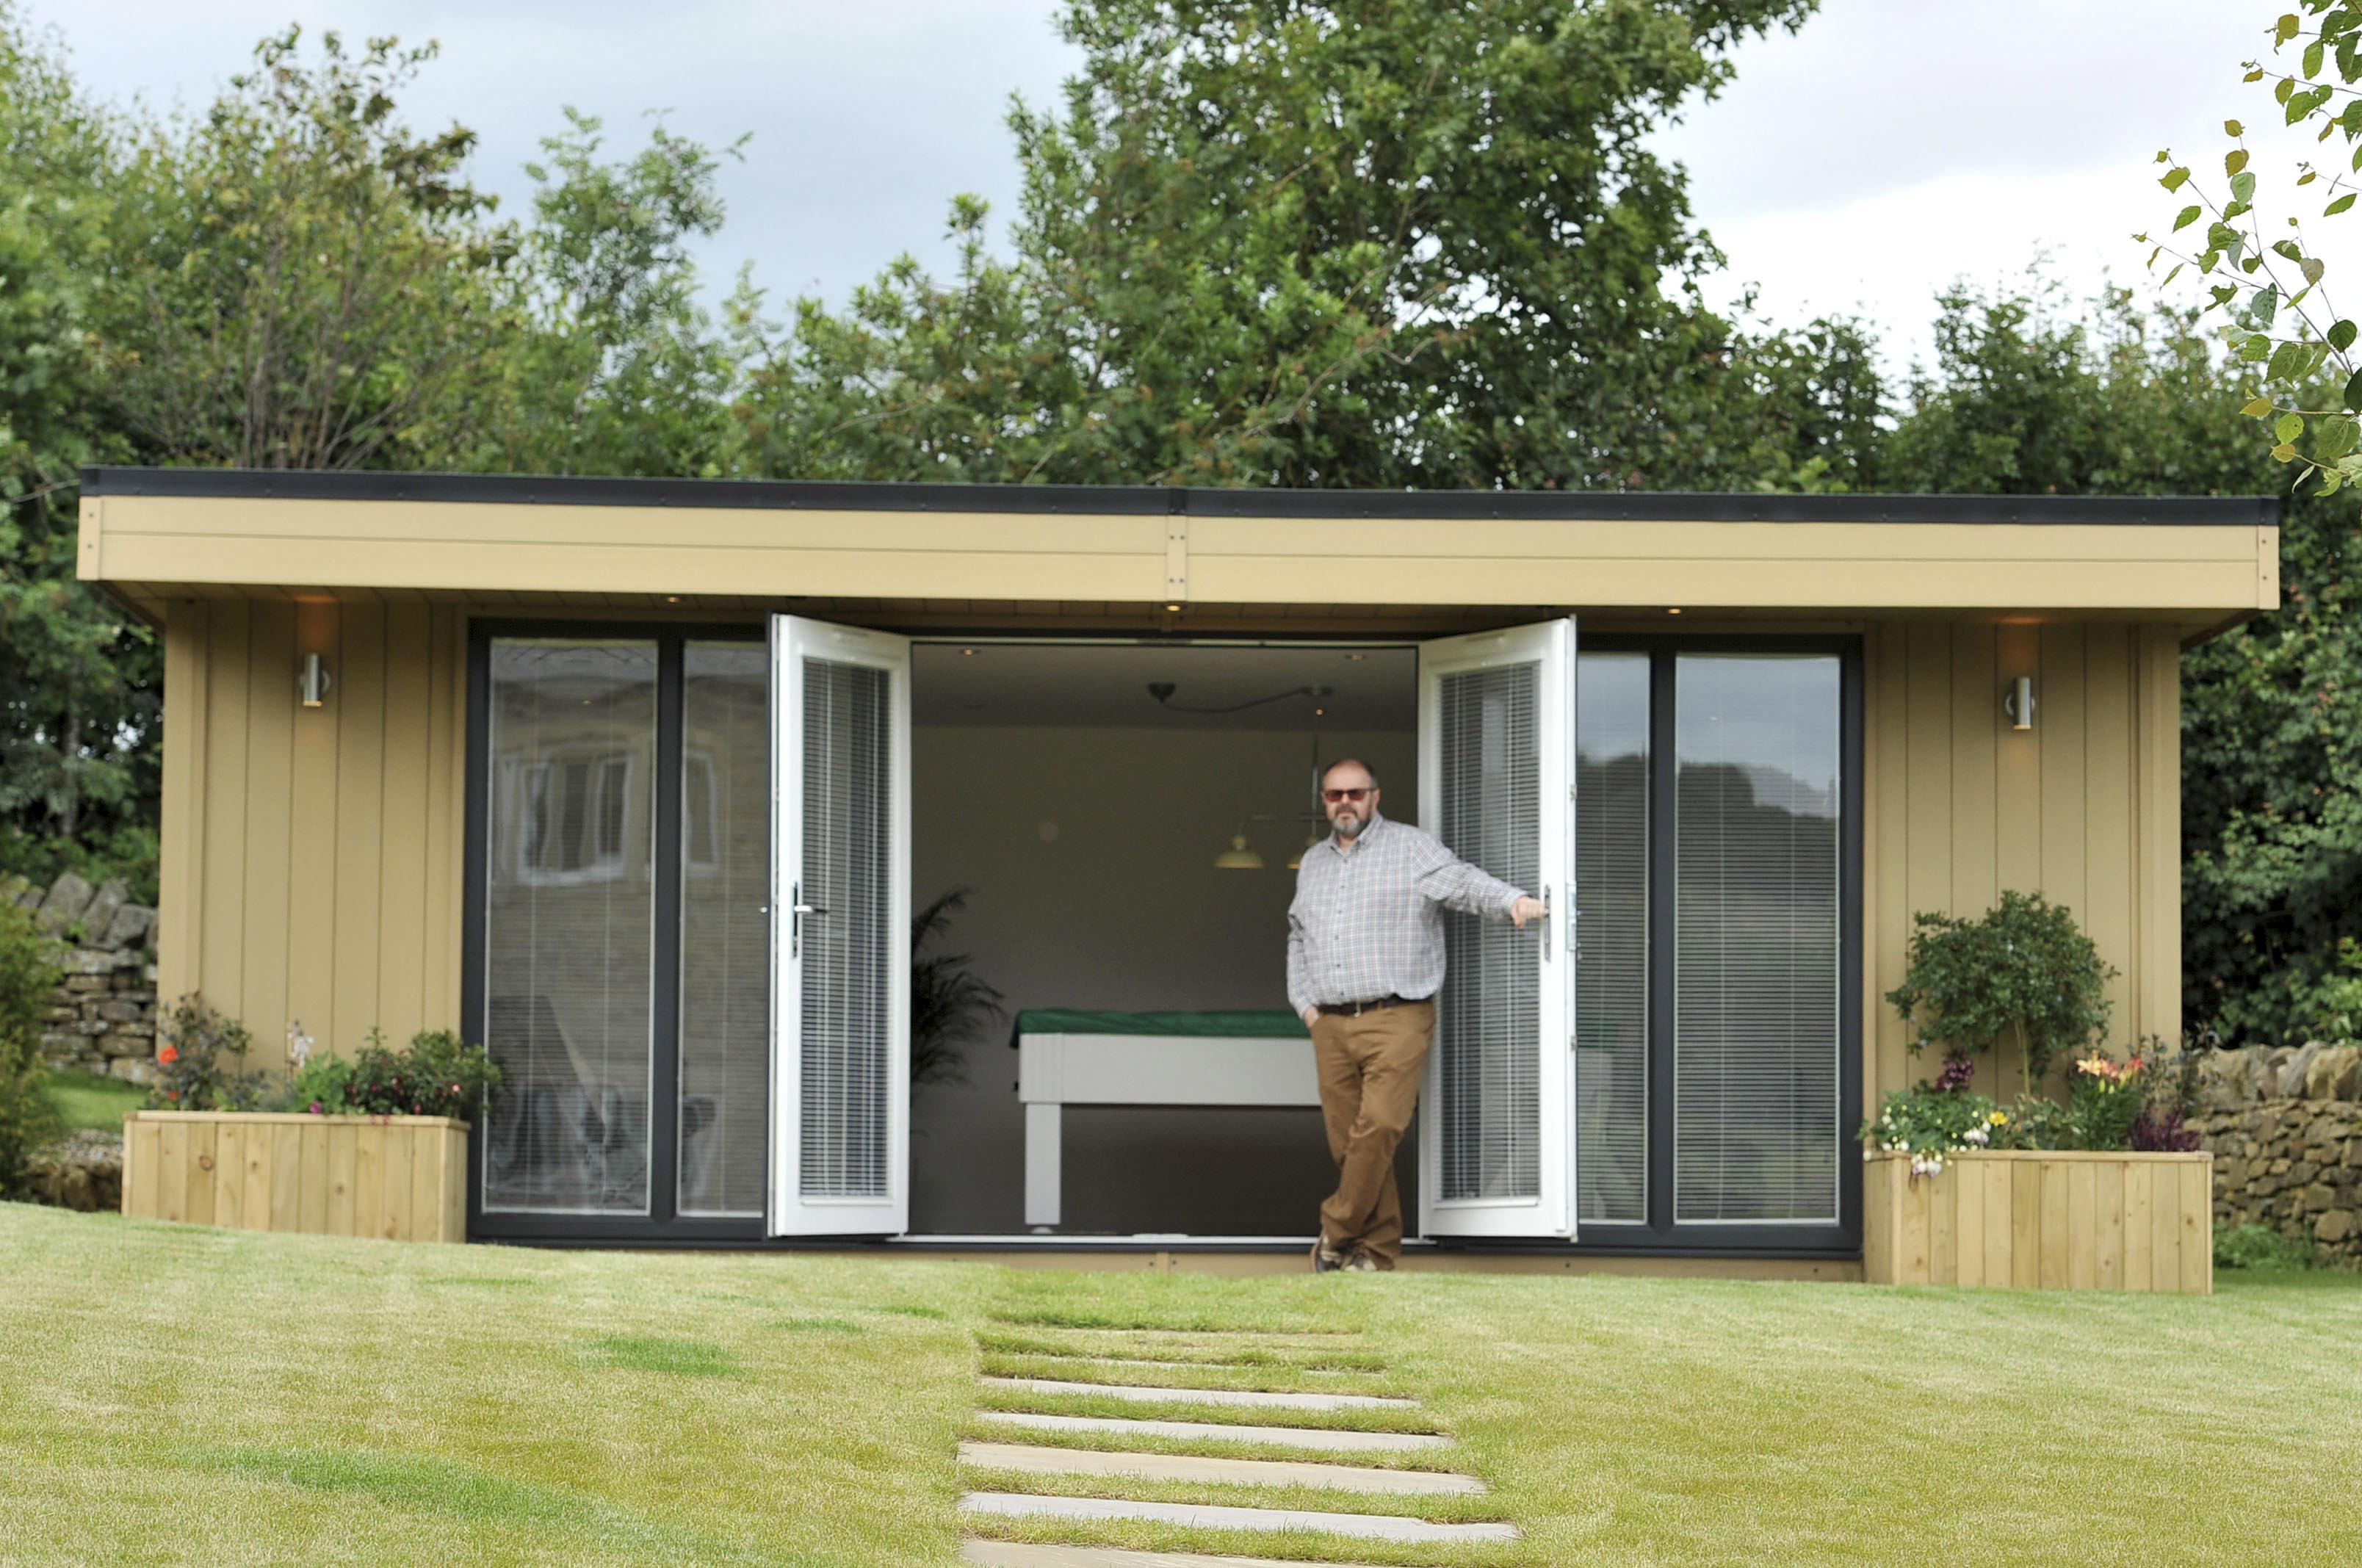 Pool house building regulations uk